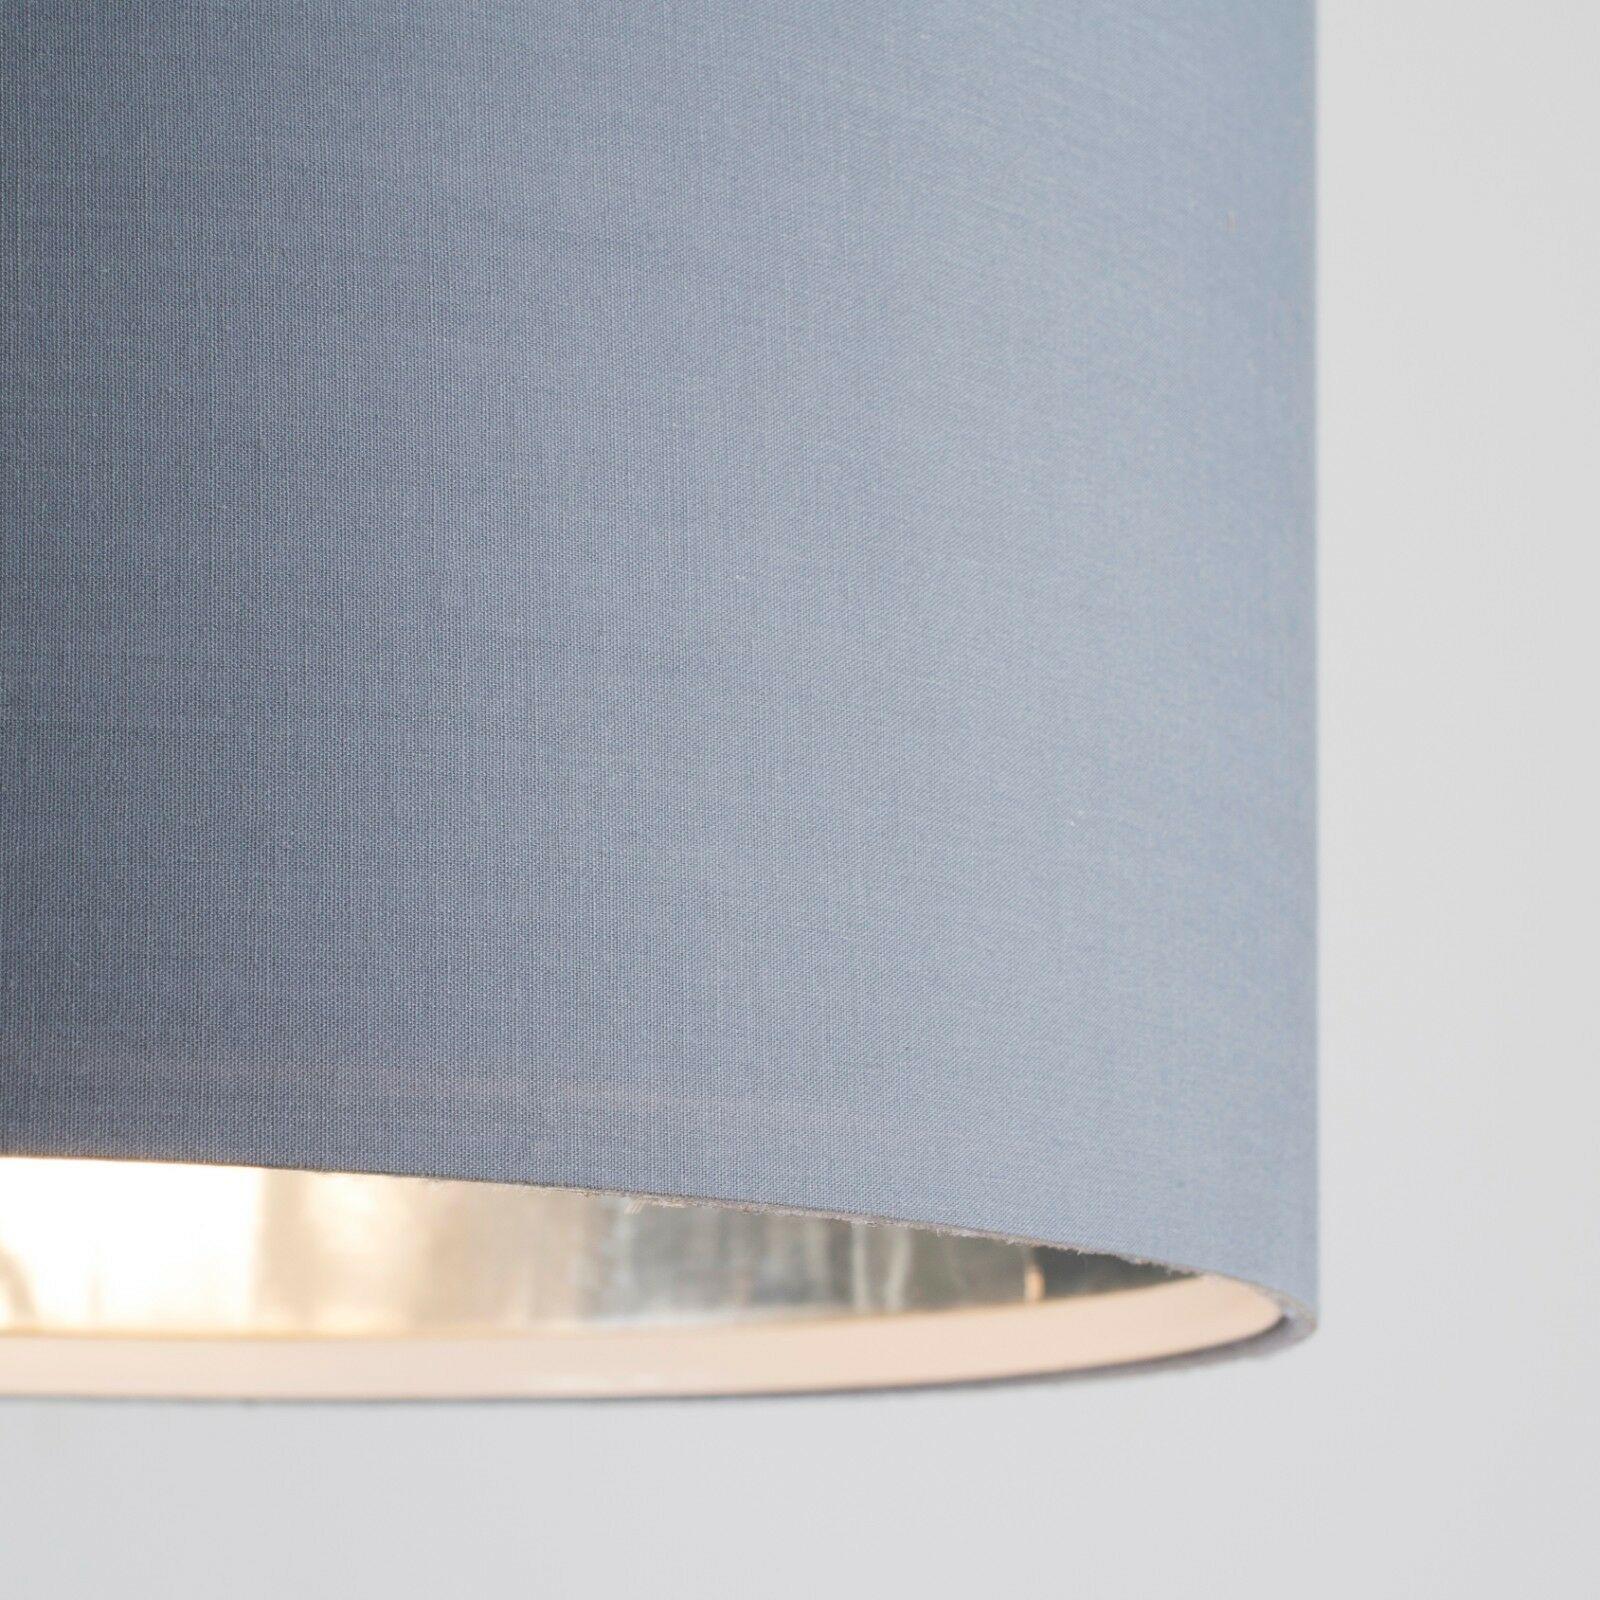 Tela-moderna-algodon-facil-ajuste-Techo-Colgante-Pantalla-De-Mesa-tonos-de-luz-de-tambor miniatura 123